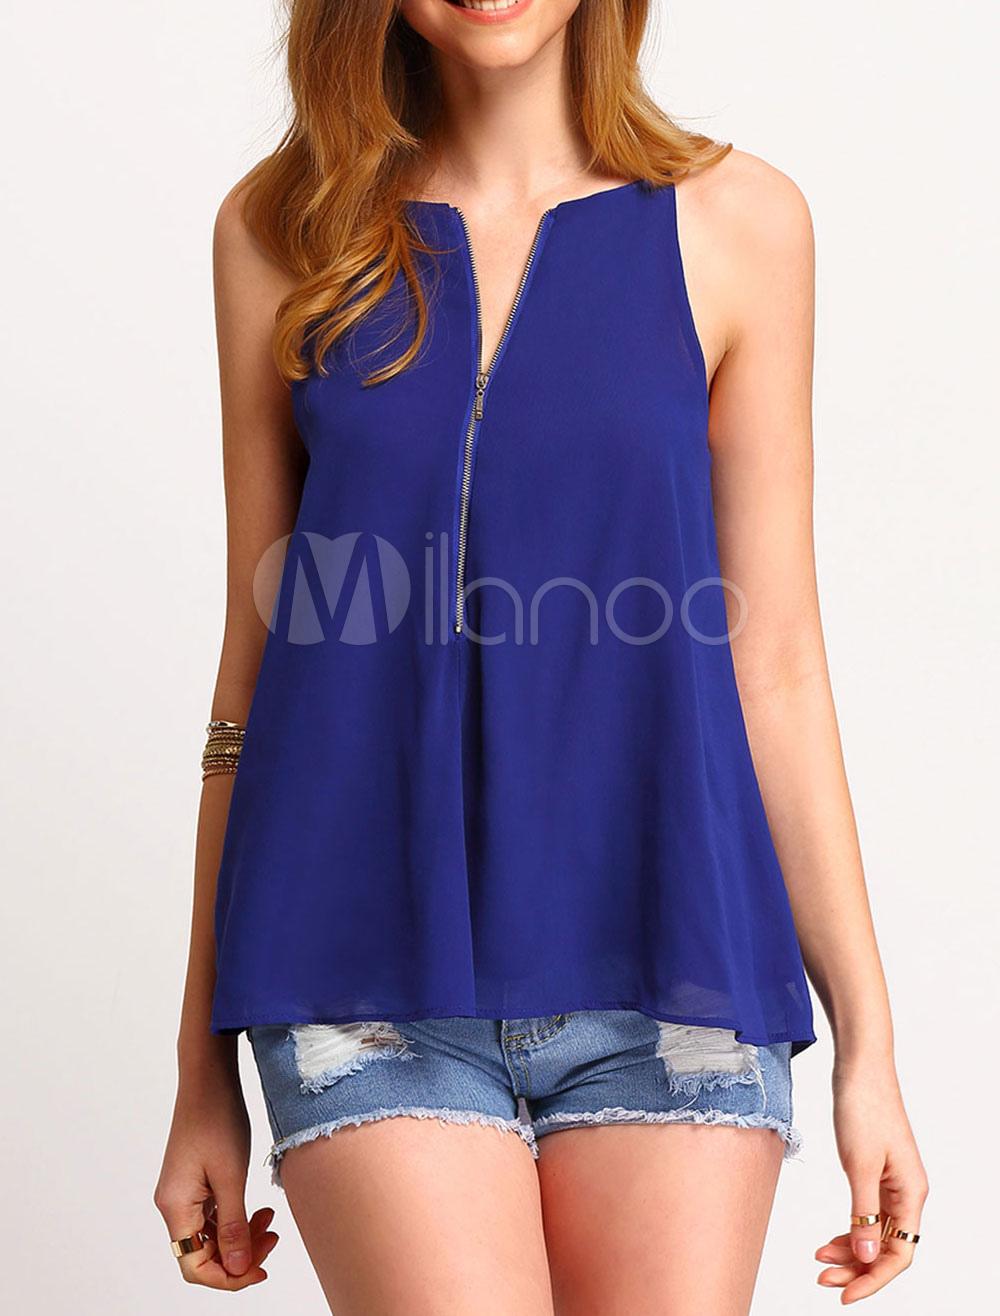 Buy Women Chiffon Camis Front Zip Solid Color Summer Top for $10.19 in Milanoo store